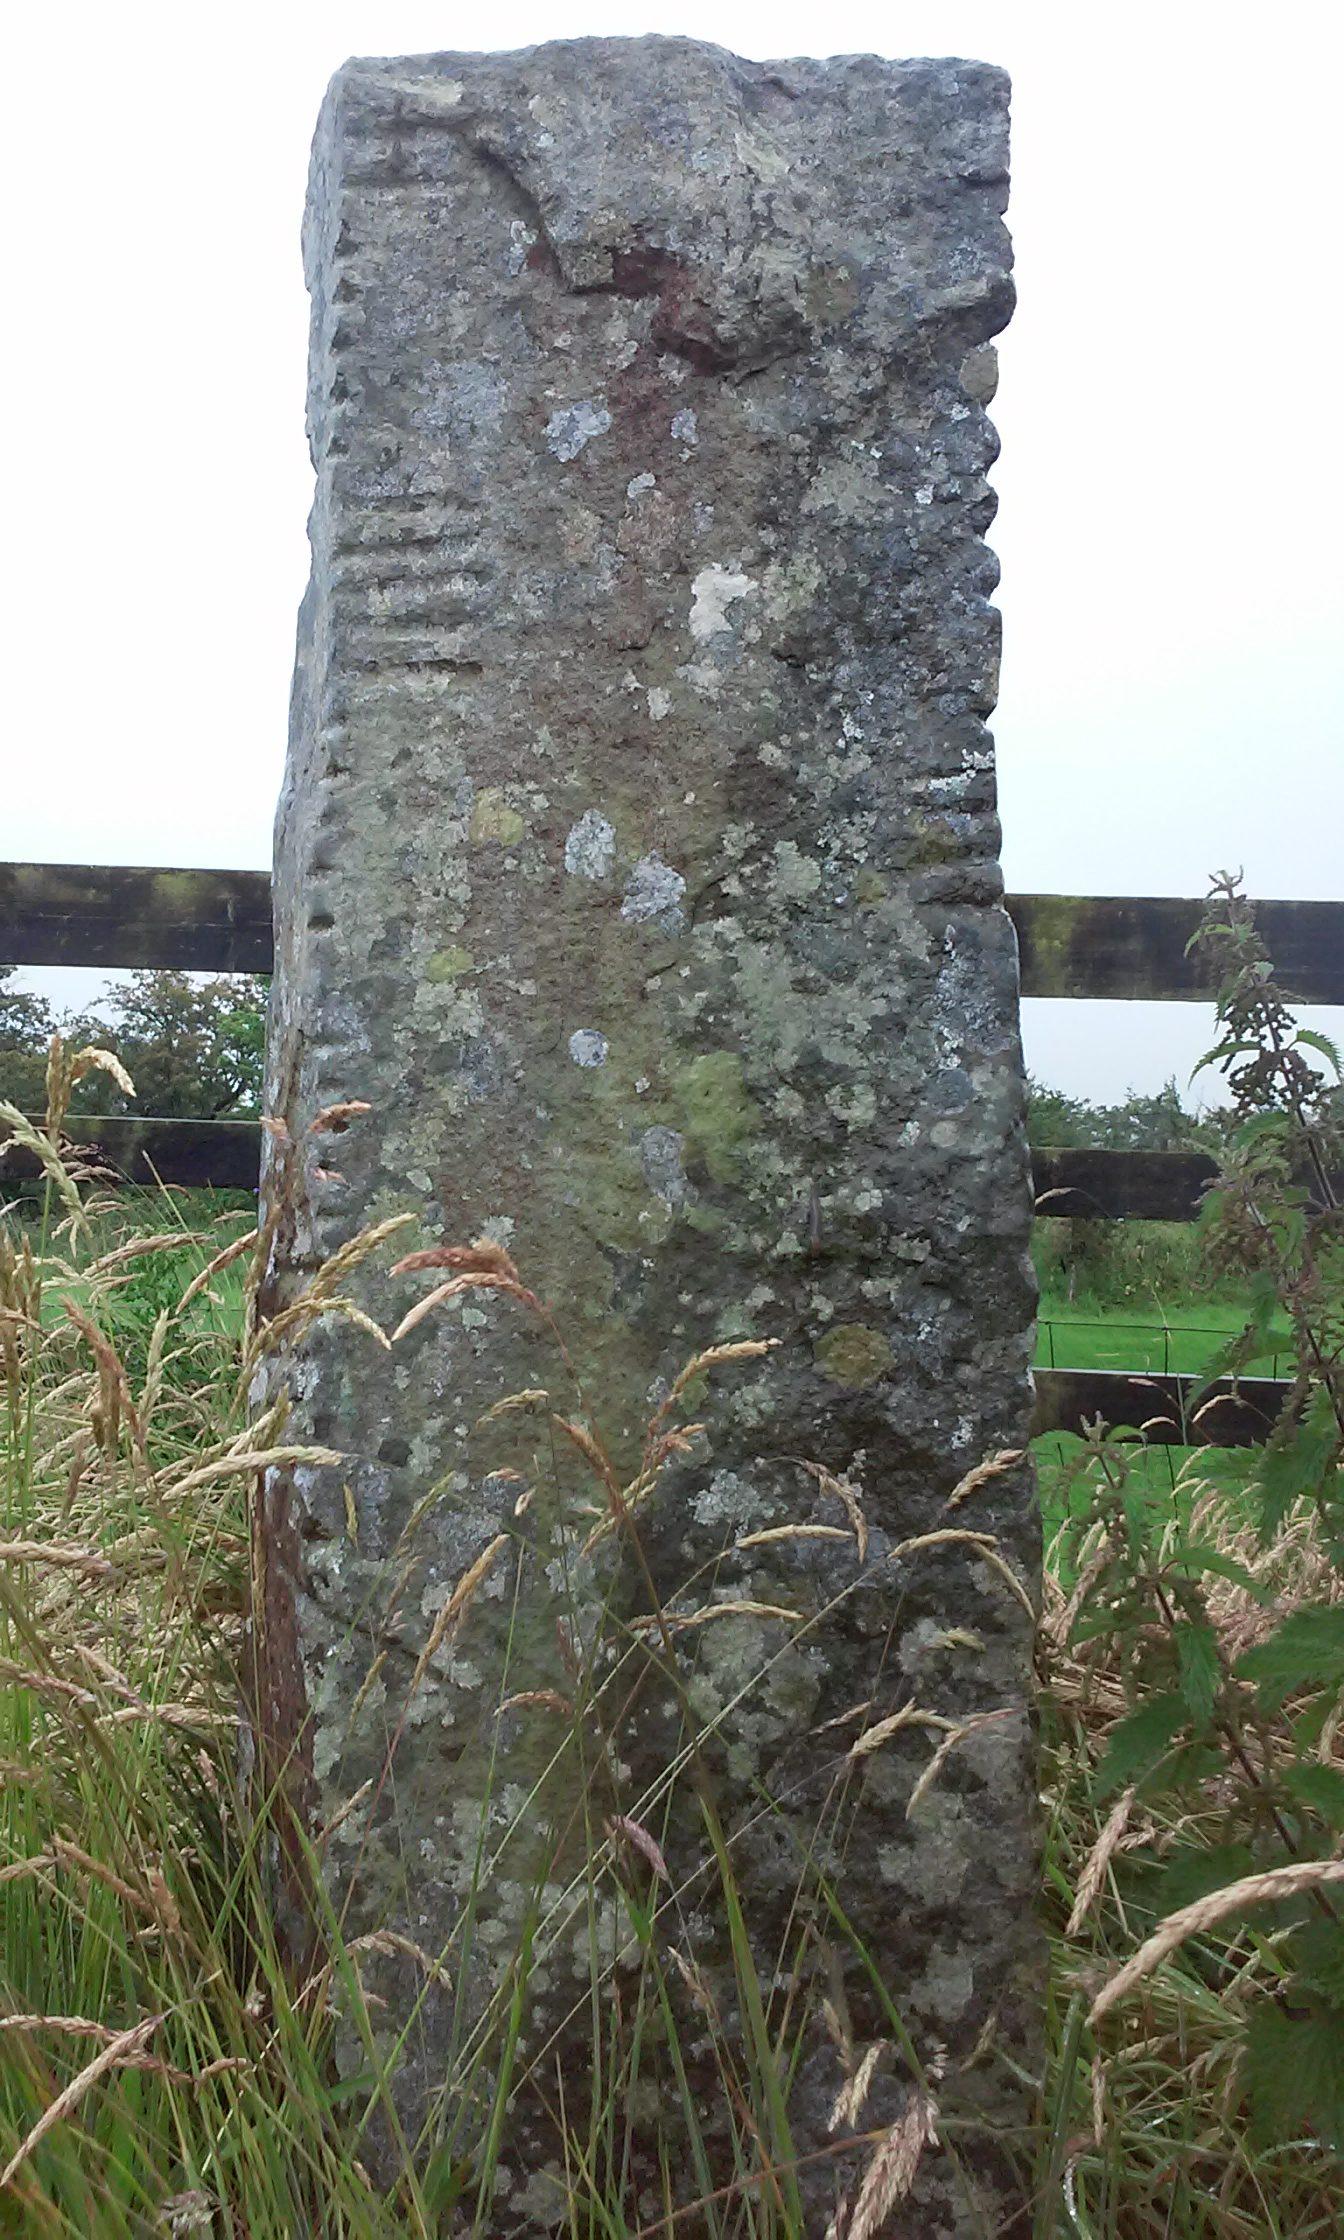 Ancient Sites Archives - Lora O'Brien - Irish Author & Guide